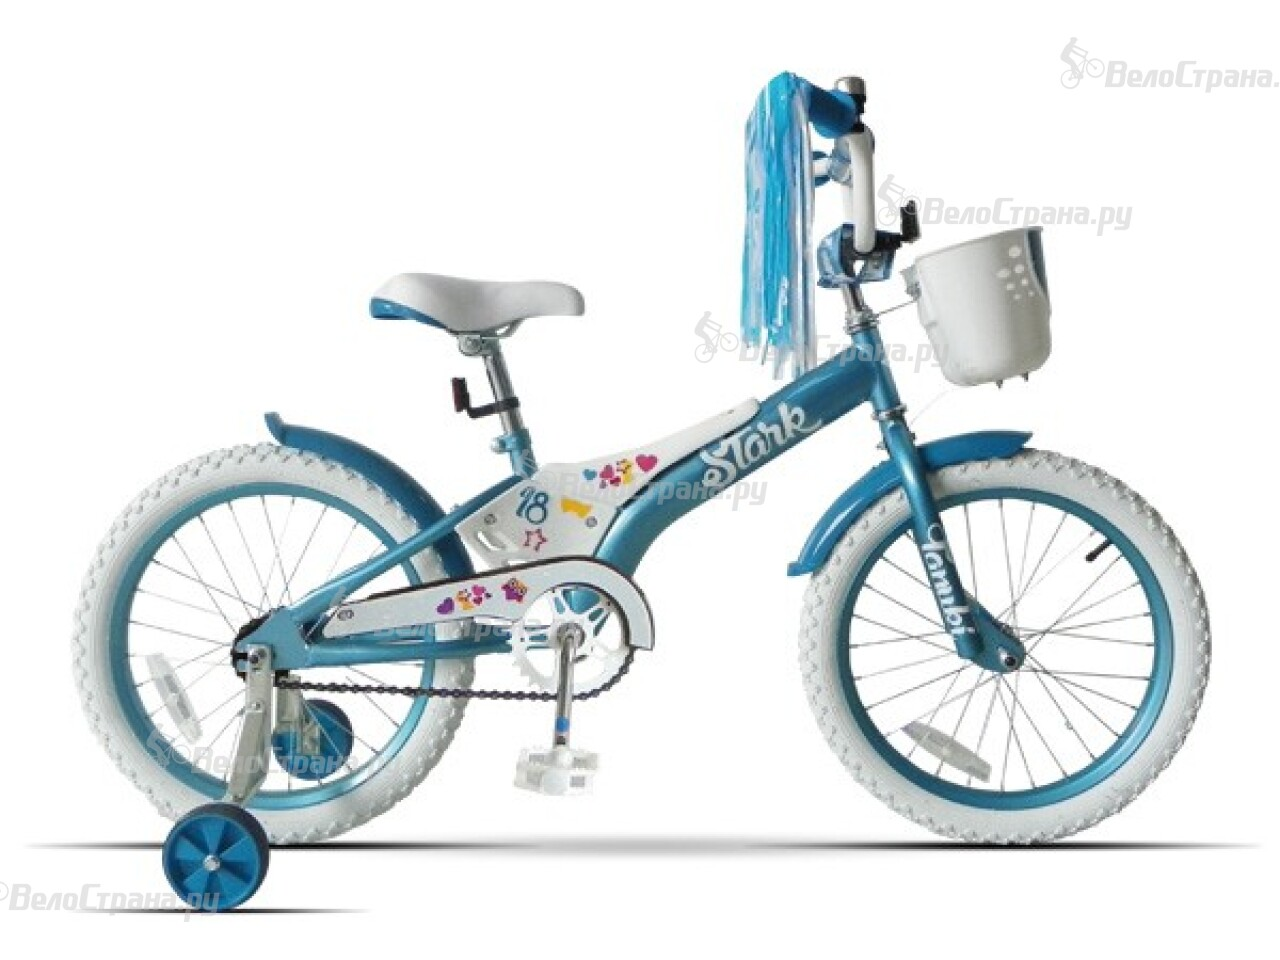 Велосипед Stark Tanuki 18 (2015)